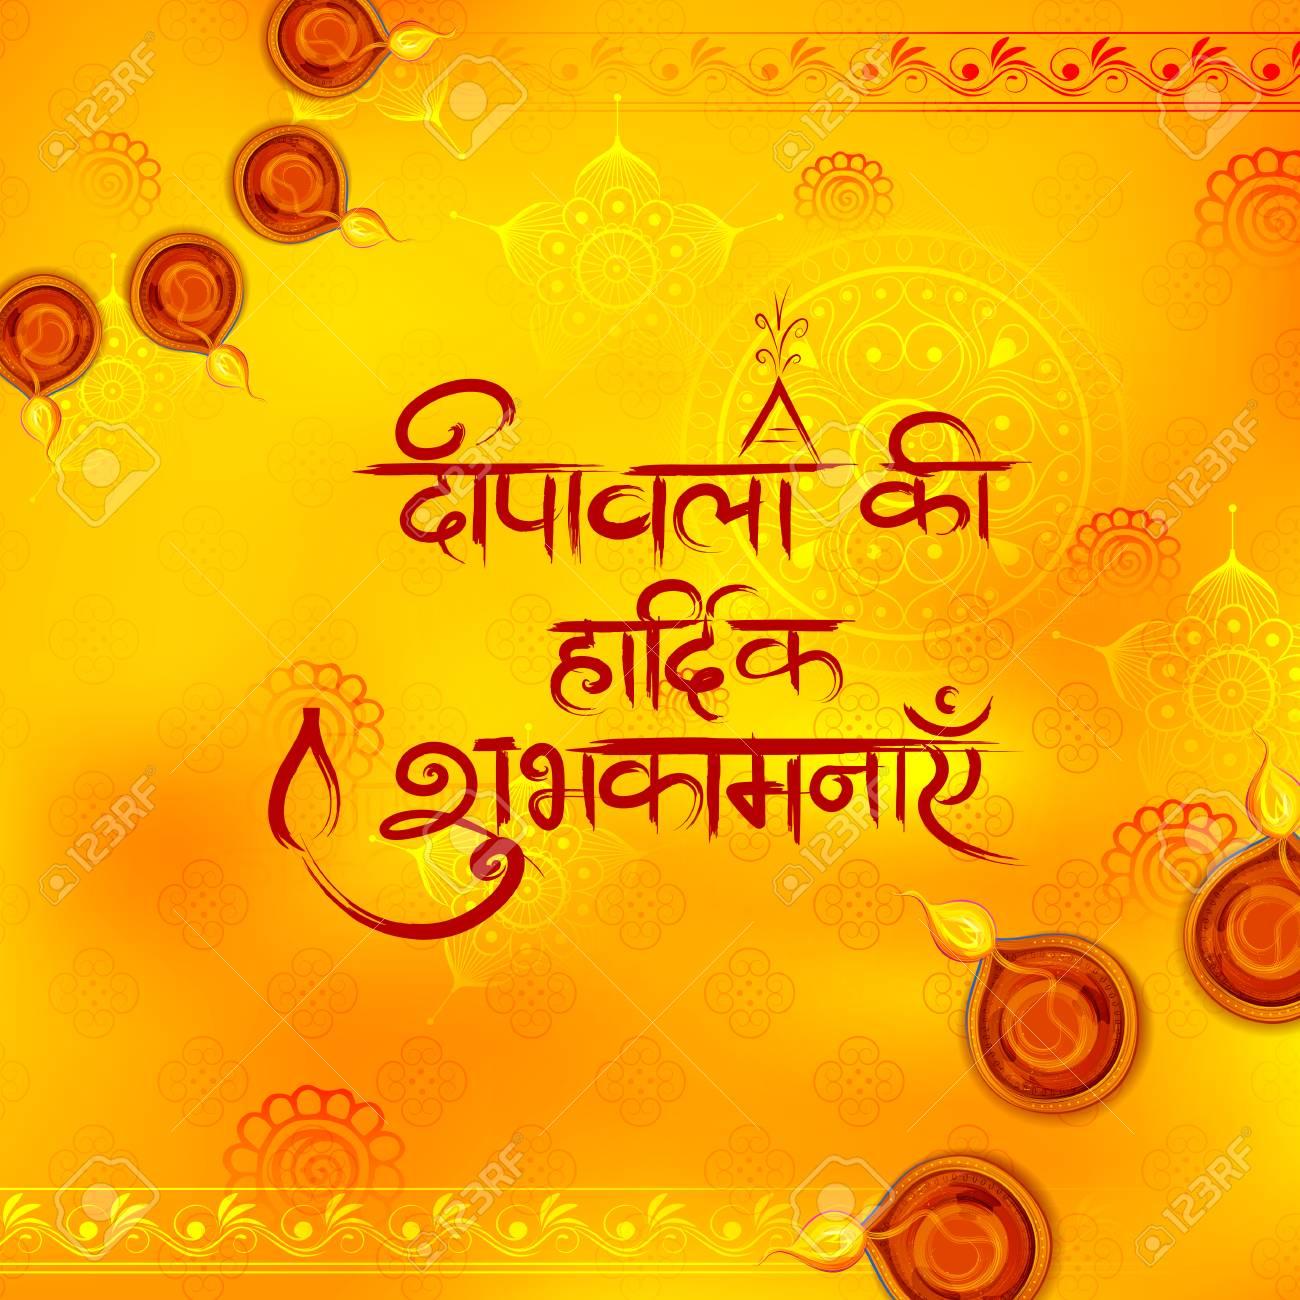 Burning Diya On Diwali Holiday Background For Light Festival